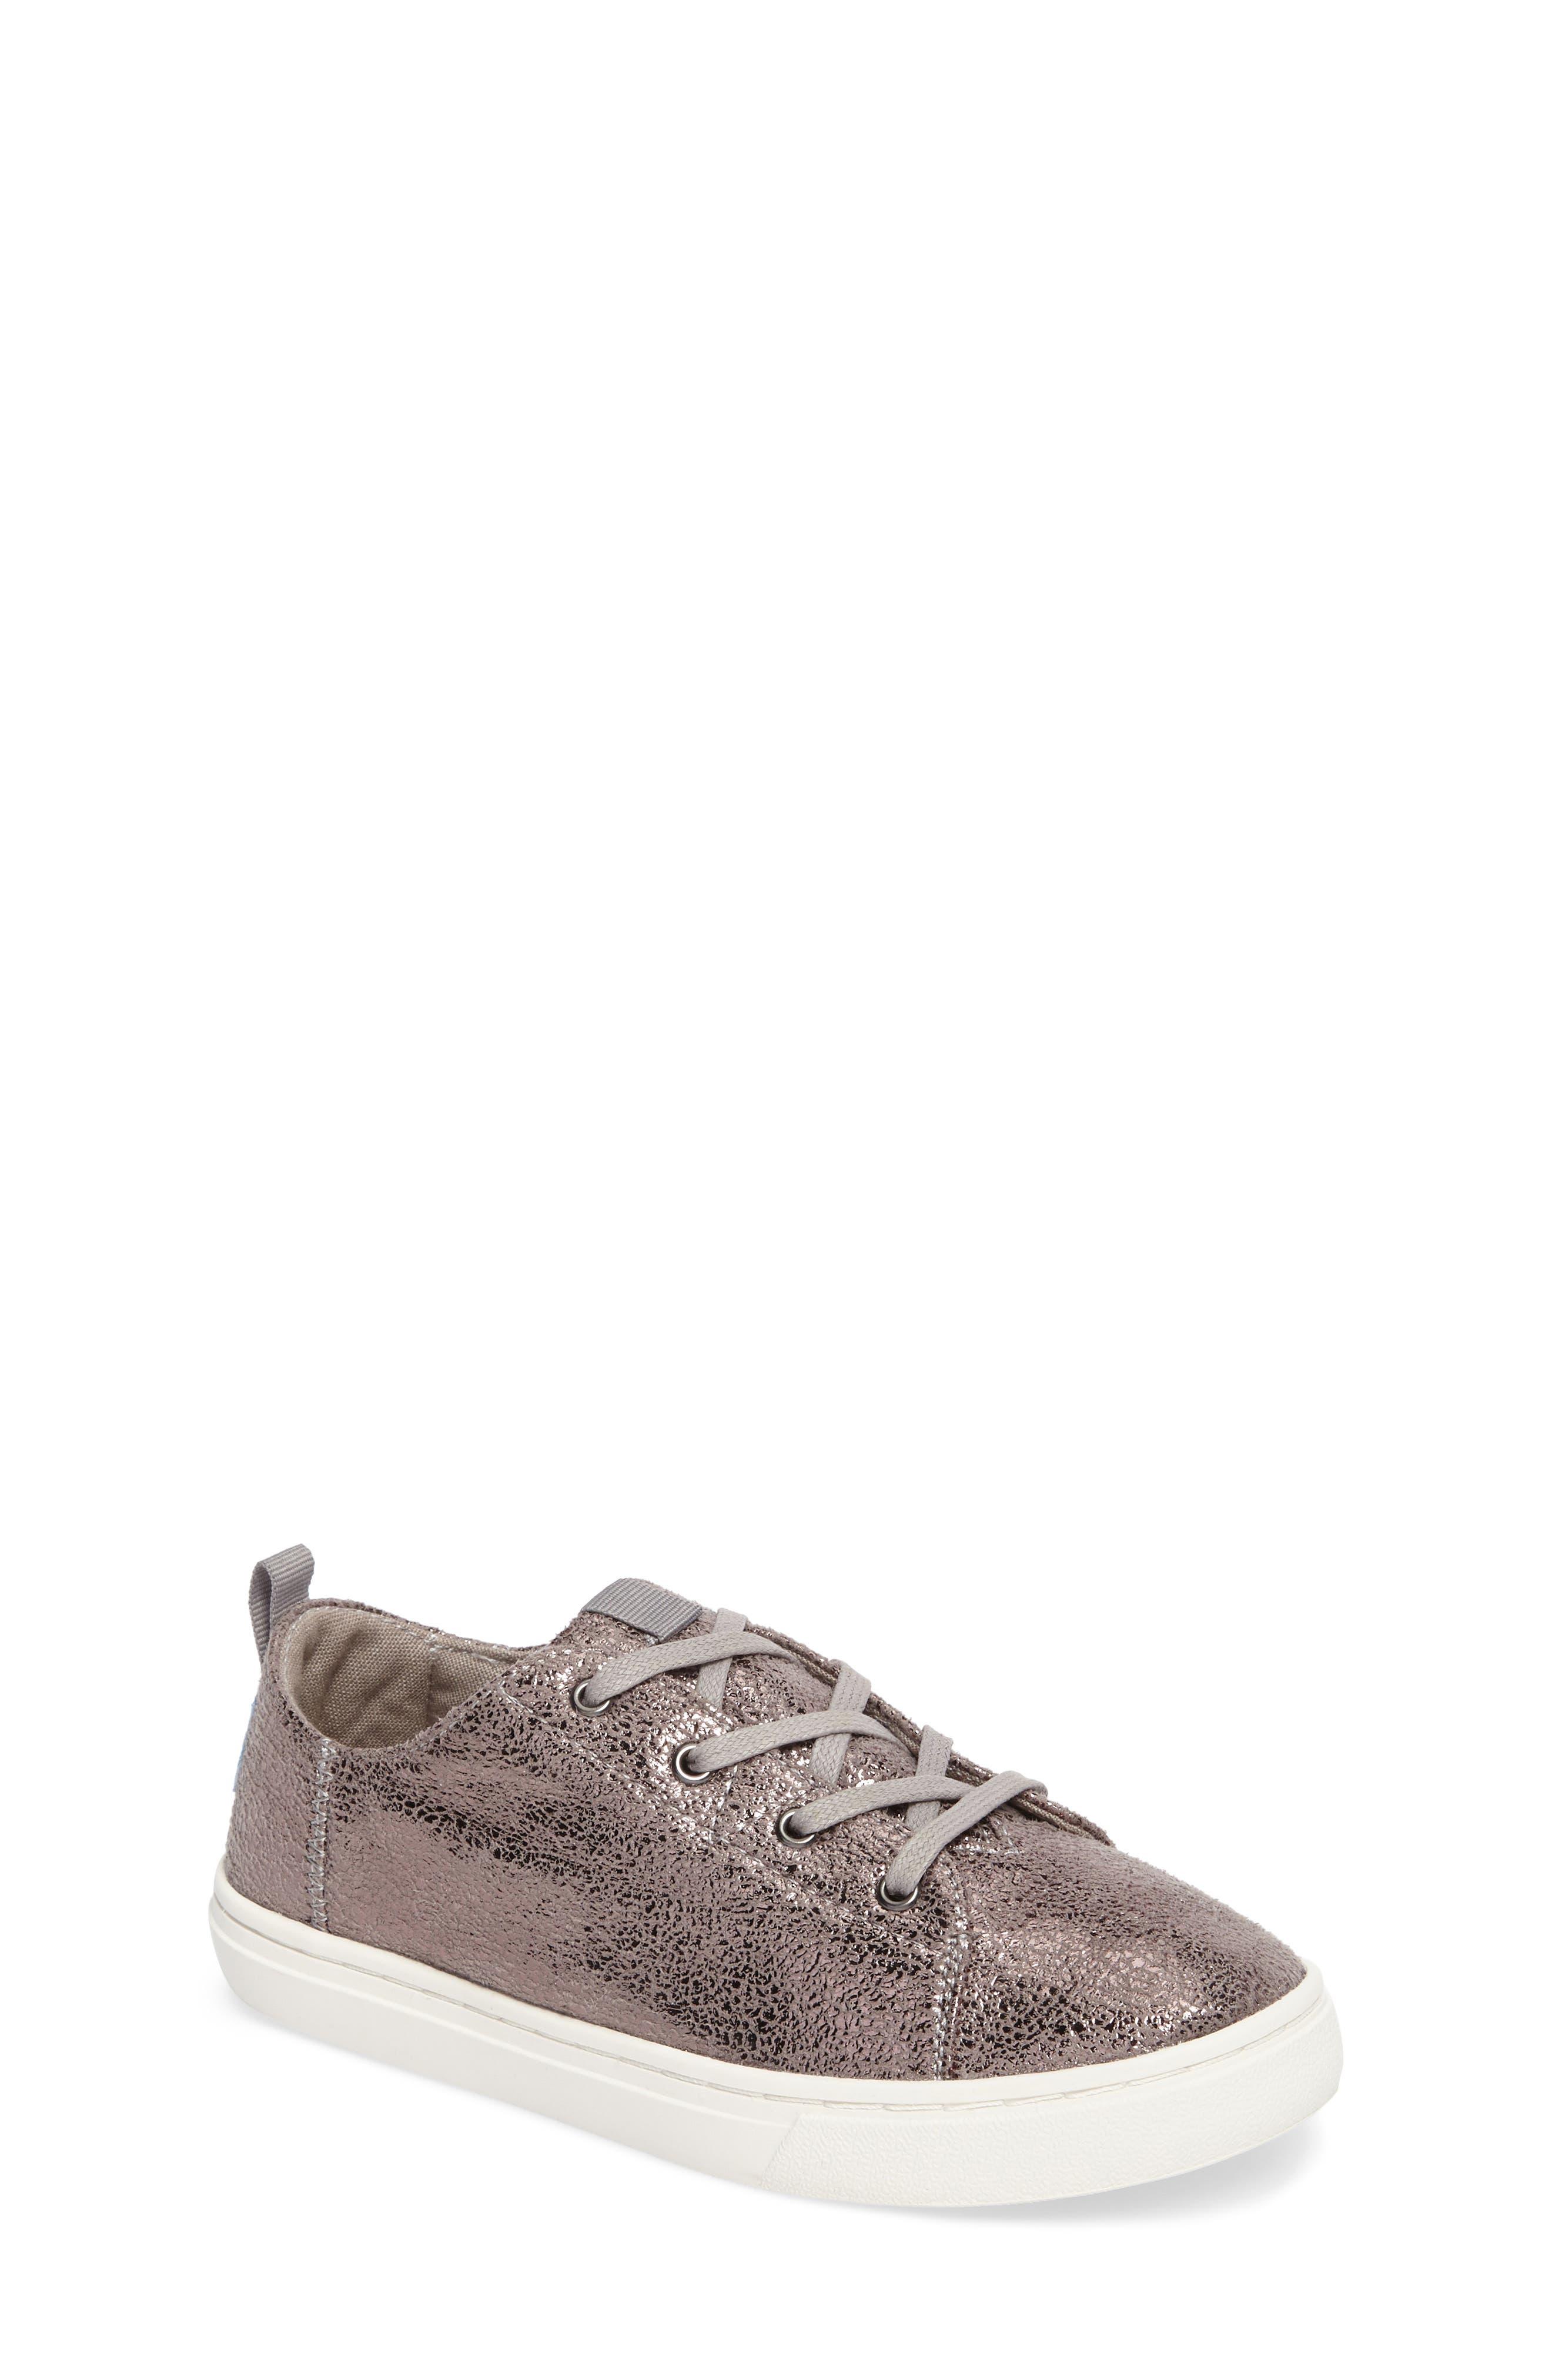 Lenny Sneaker,                         Main,                         color, 040